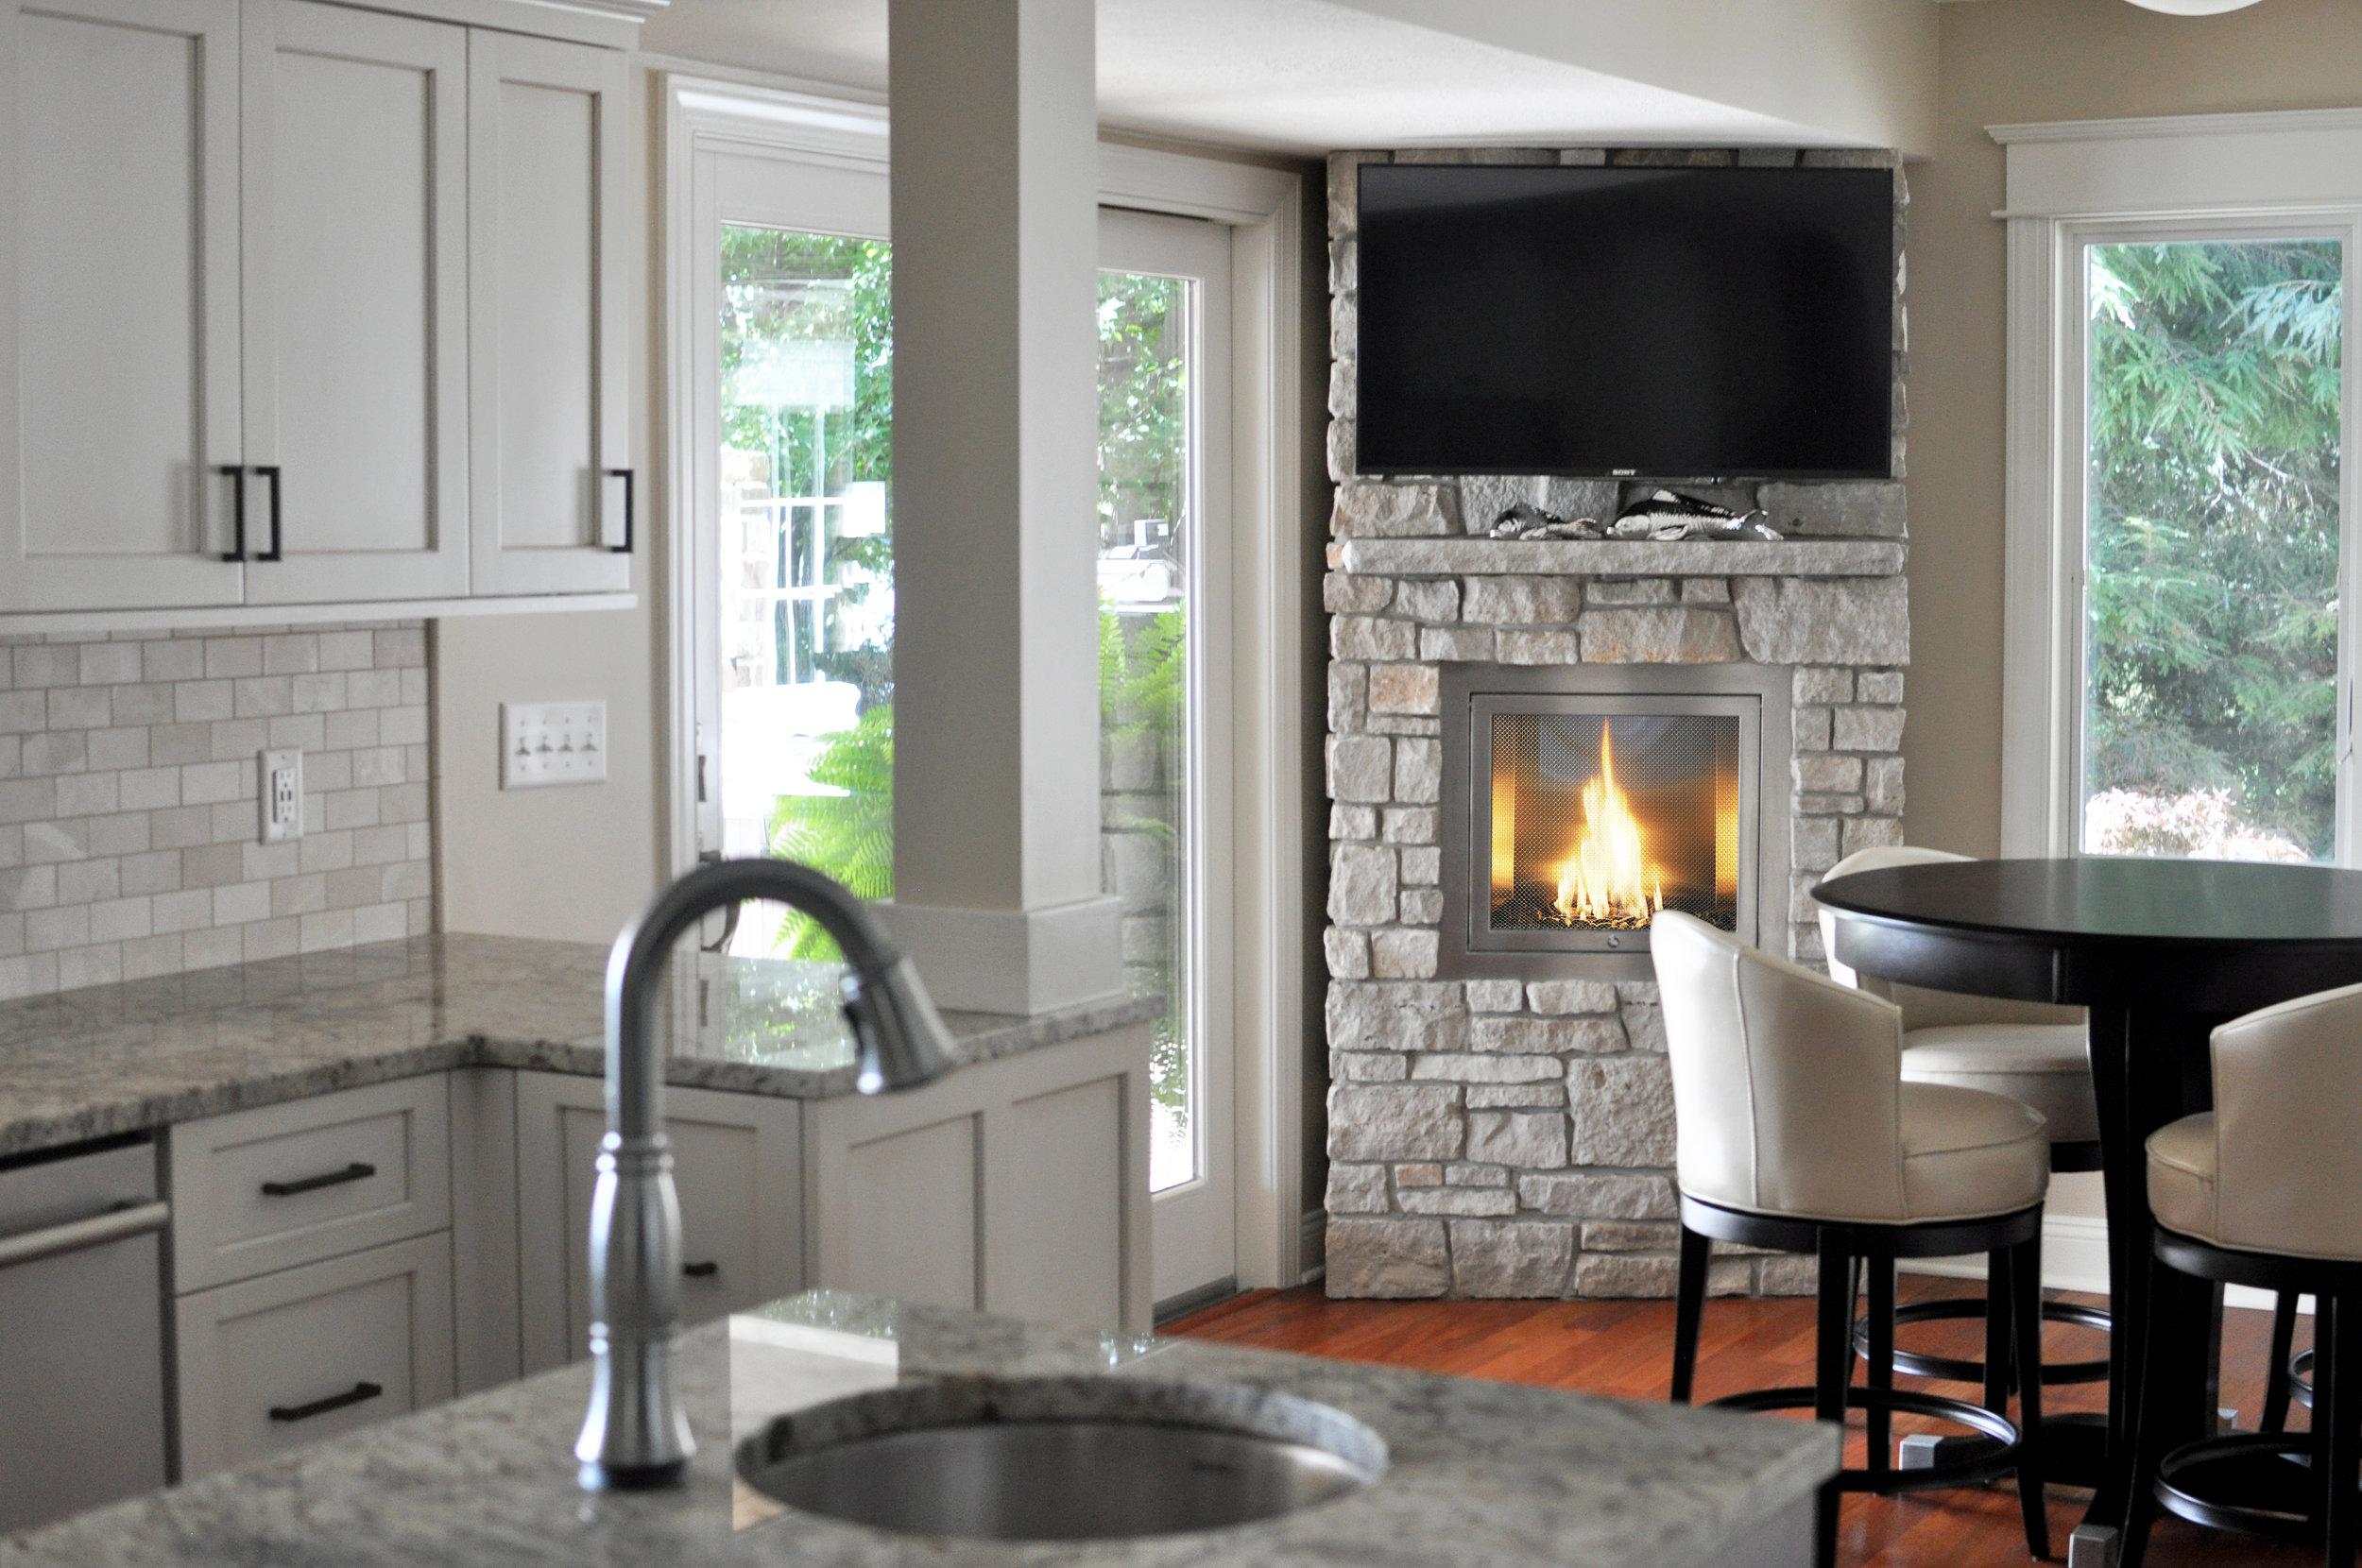 Lifestyle Kitchen Studio- Barrett Residence-edit2.jpg